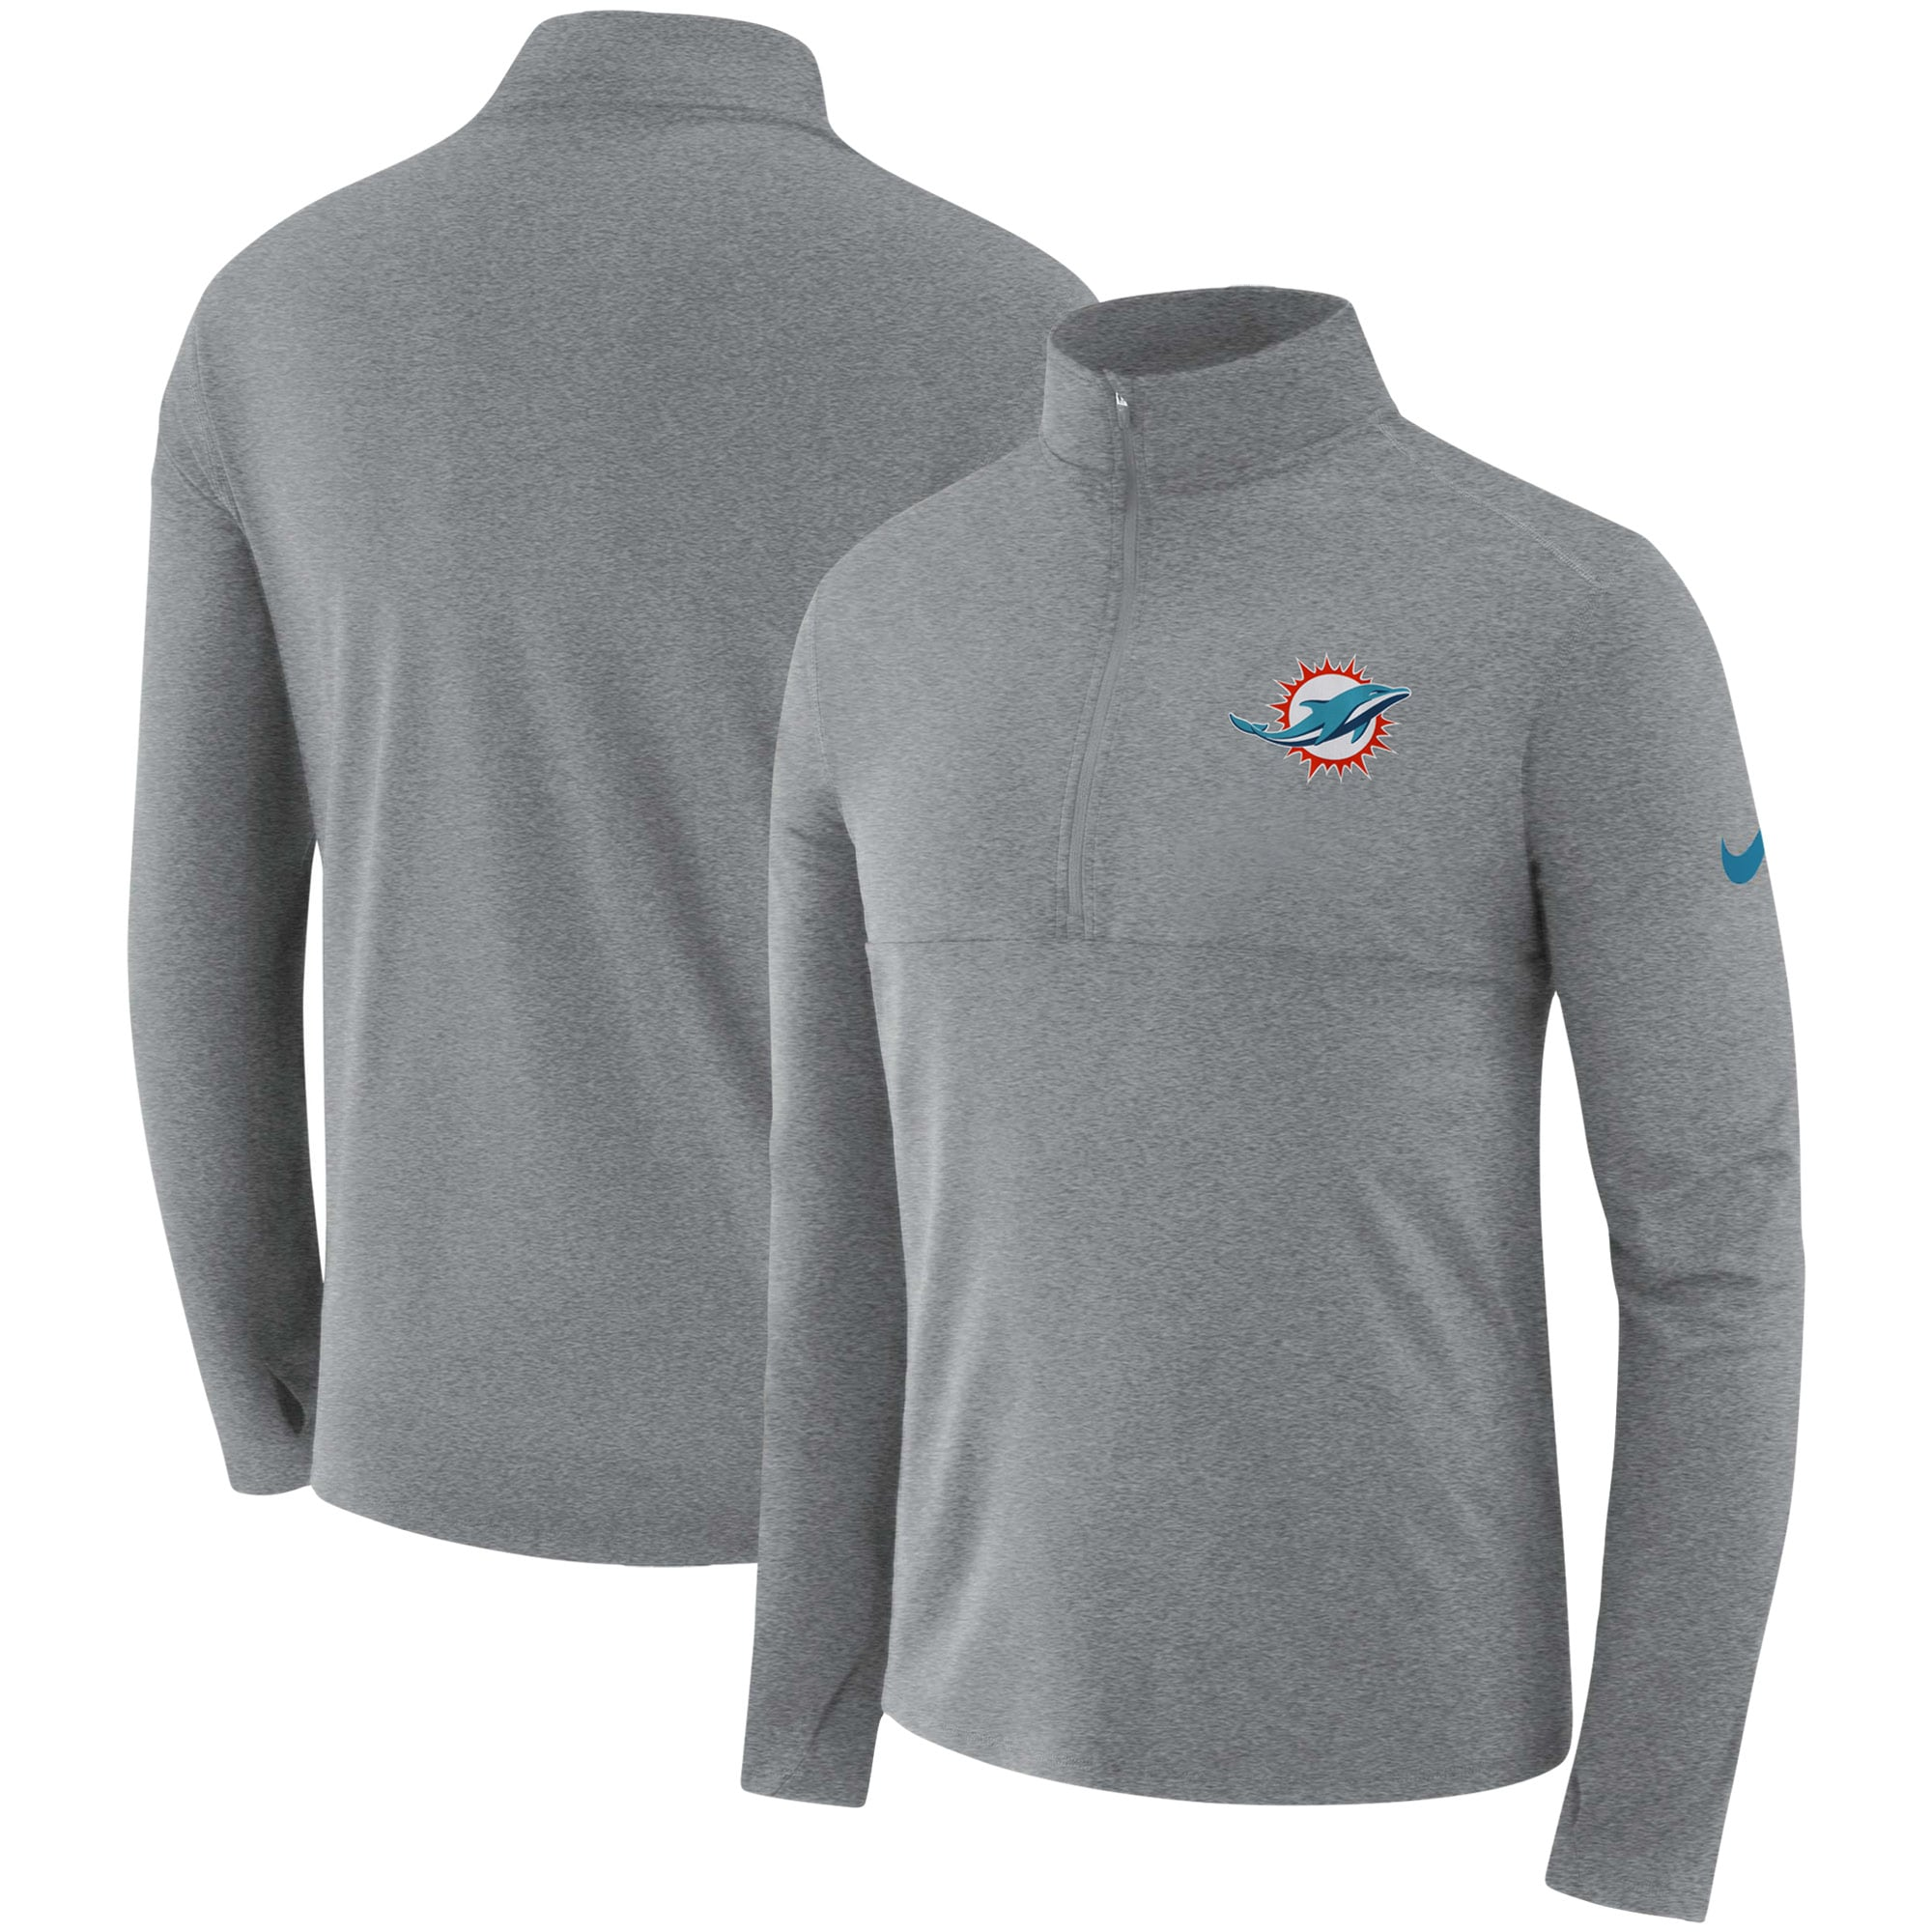 Miami Dolphins Nike Fan Gear Element Half-Zip Performance Jacket - Heathered Gray